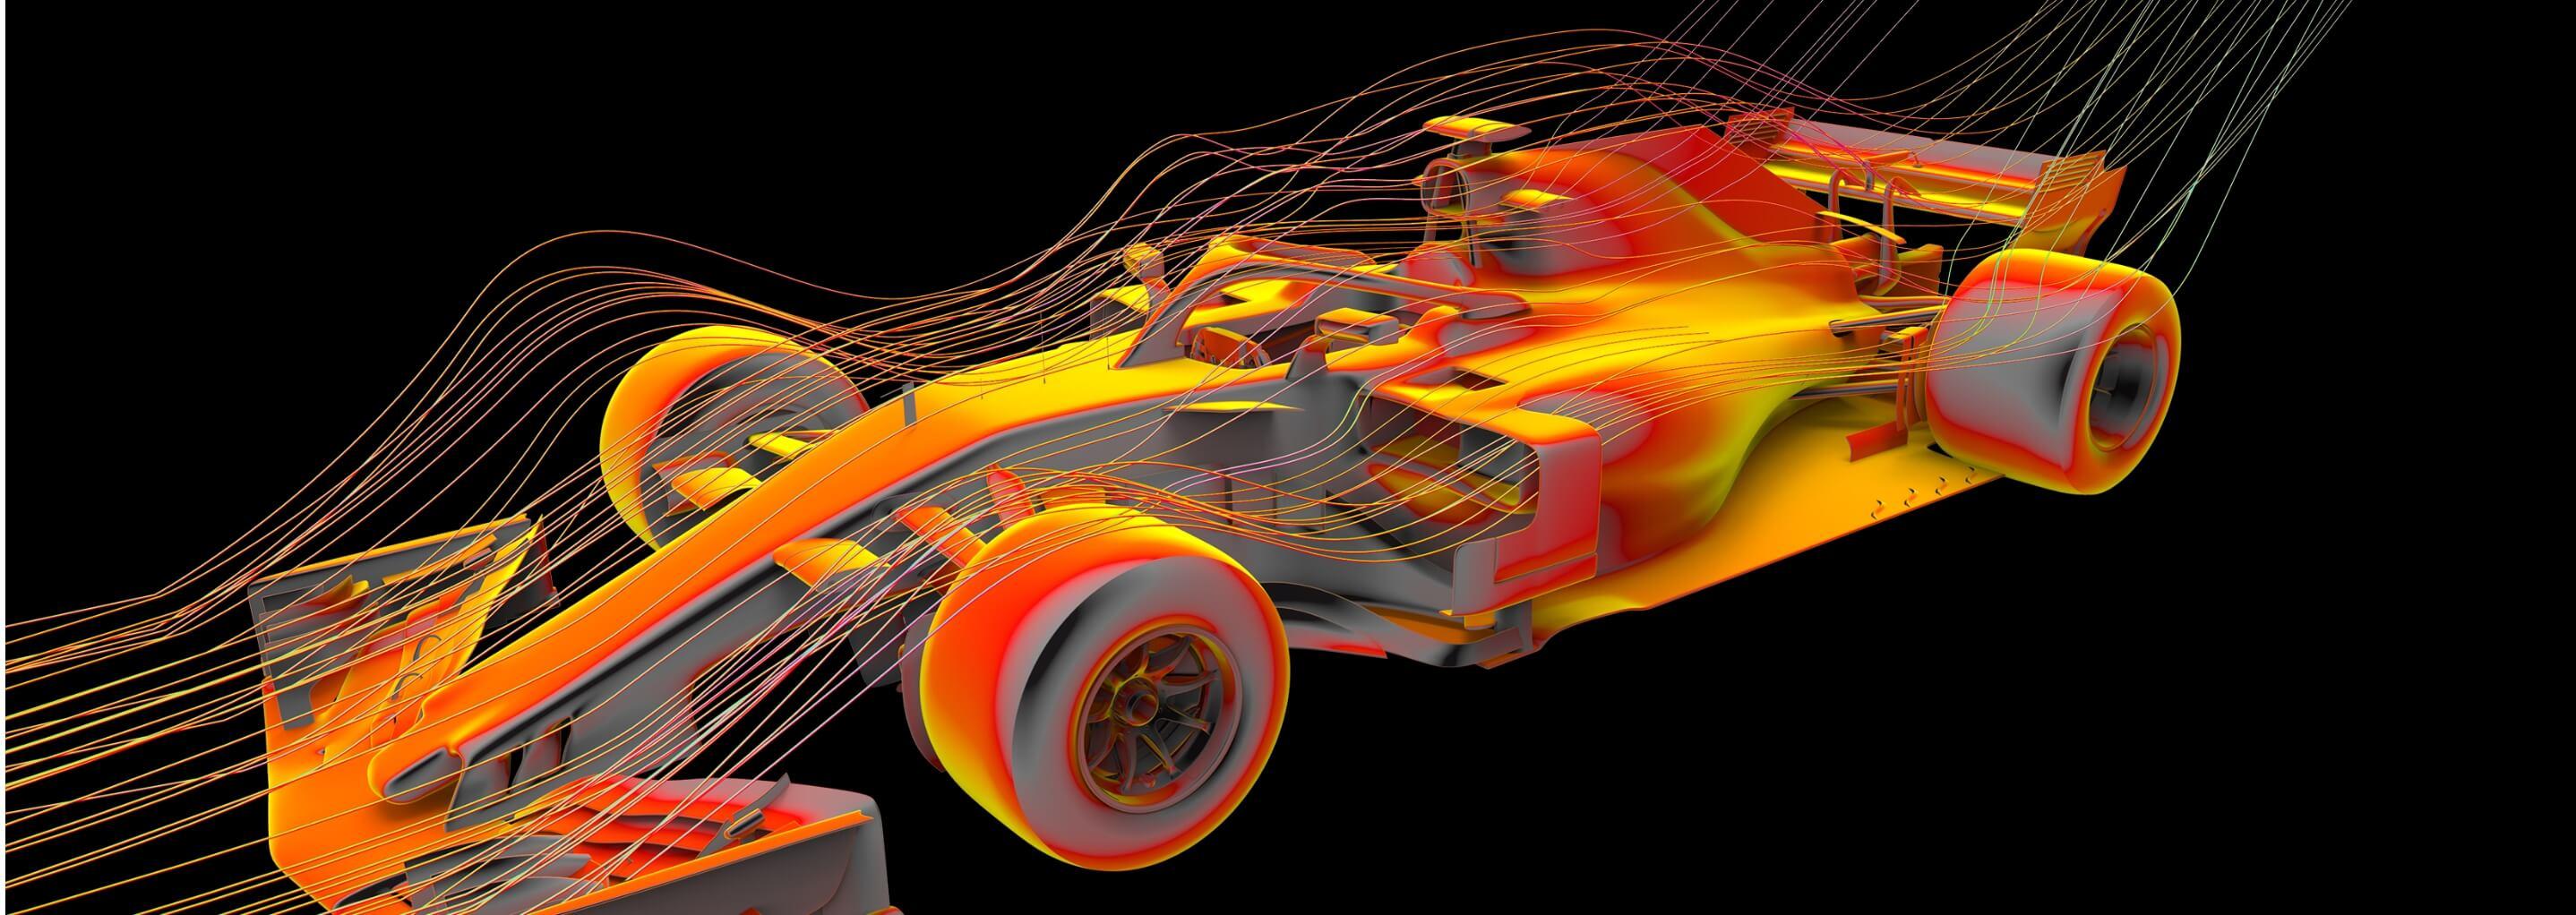 CFD analysis of a Formula One car